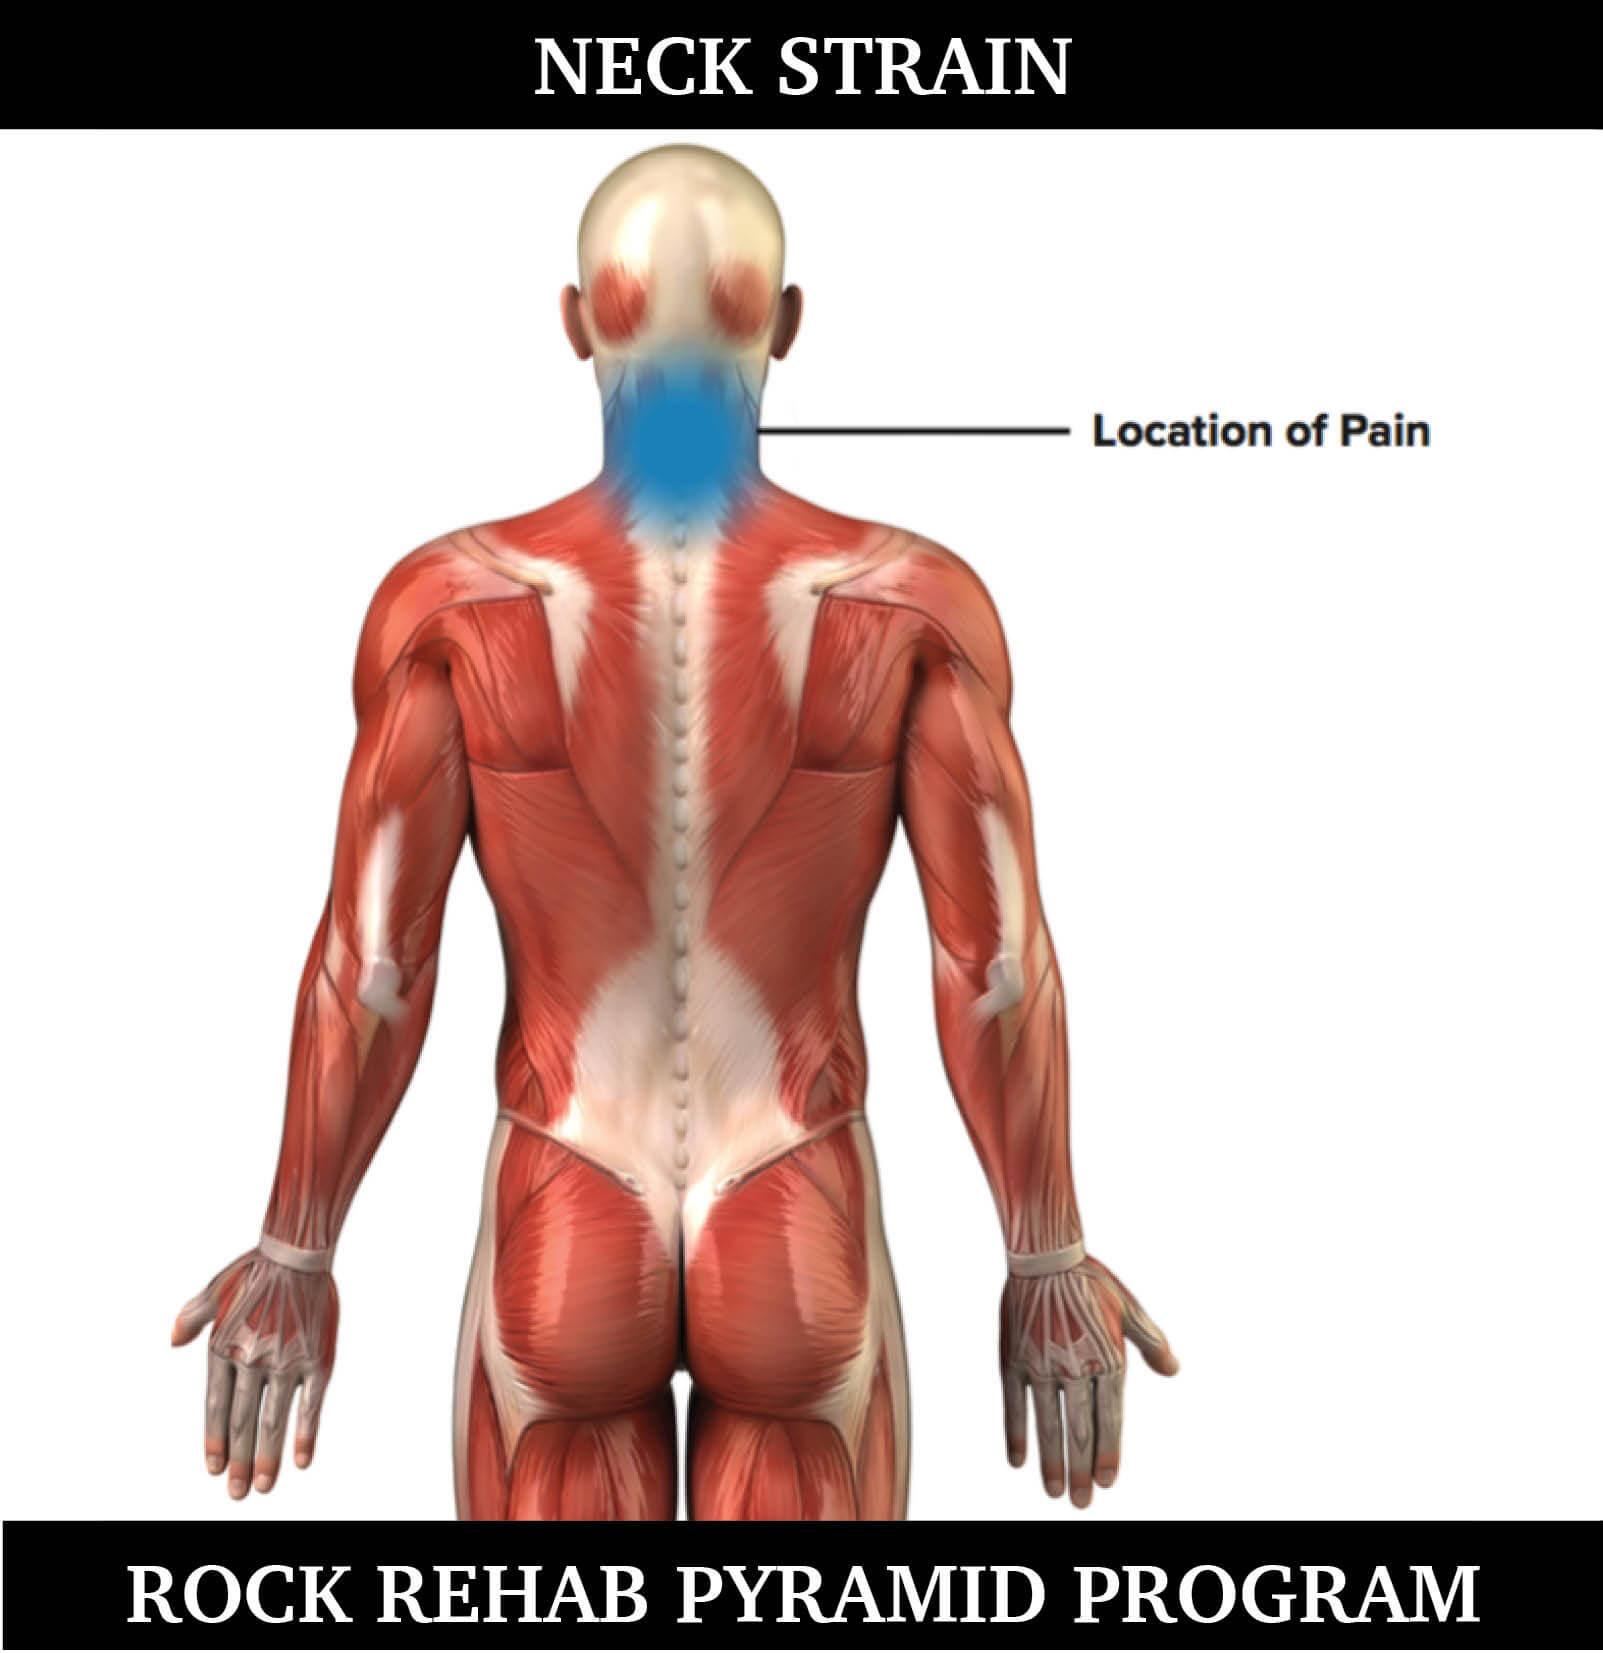 Neck Strain Protocol For Rock Climbers